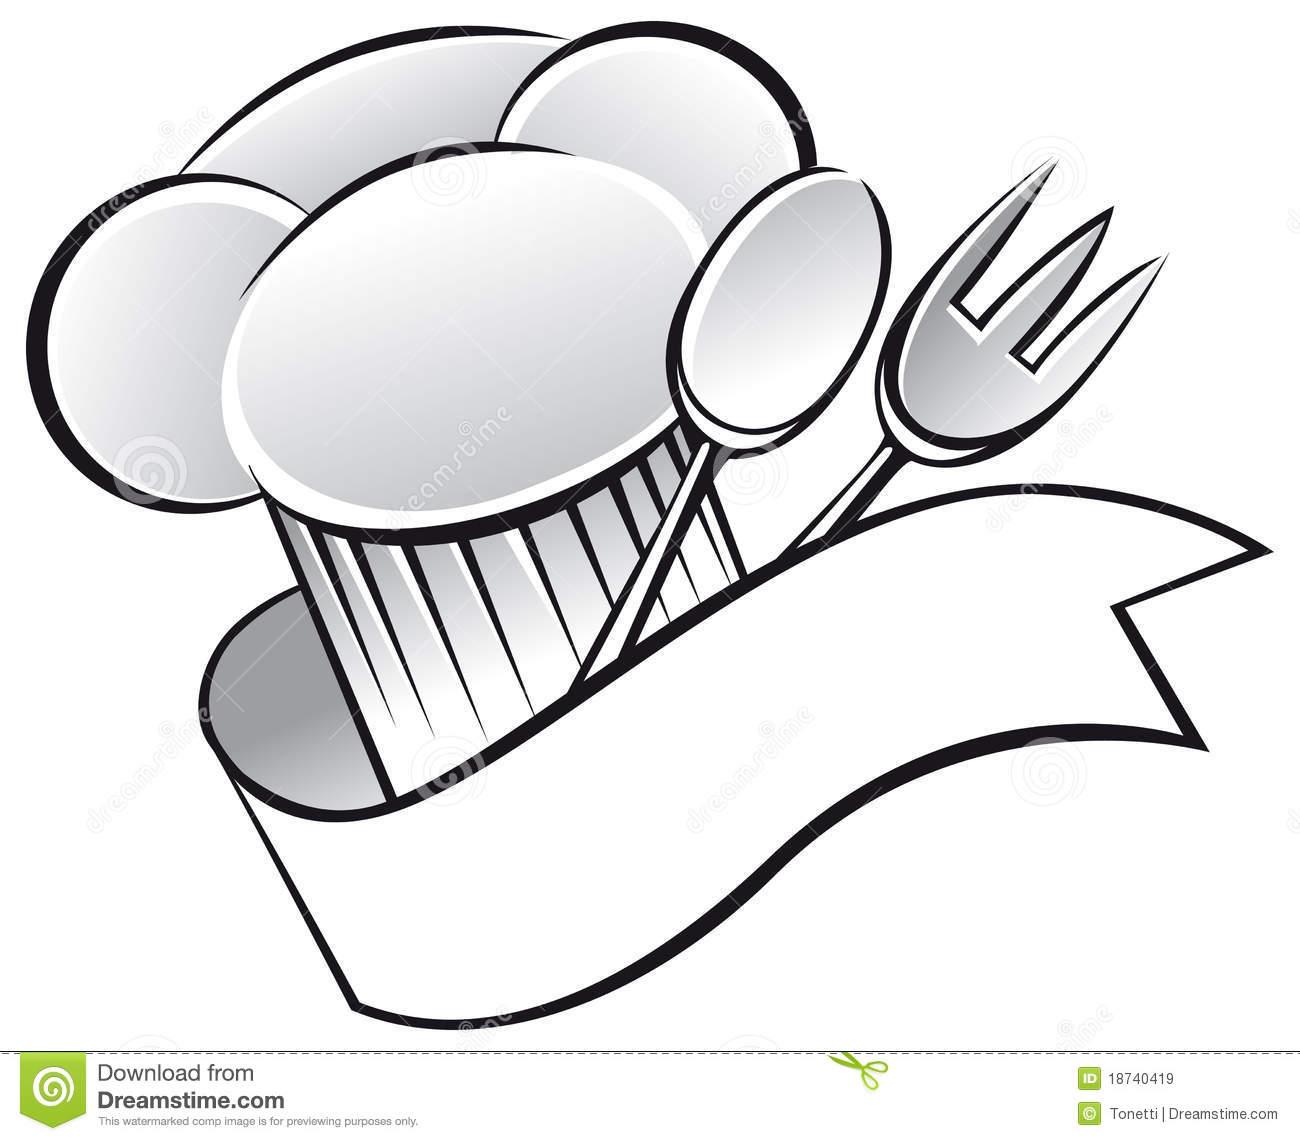 Chef utensils clipart png transparent Utensils and chef hat clipart - Clipartable.com png transparent